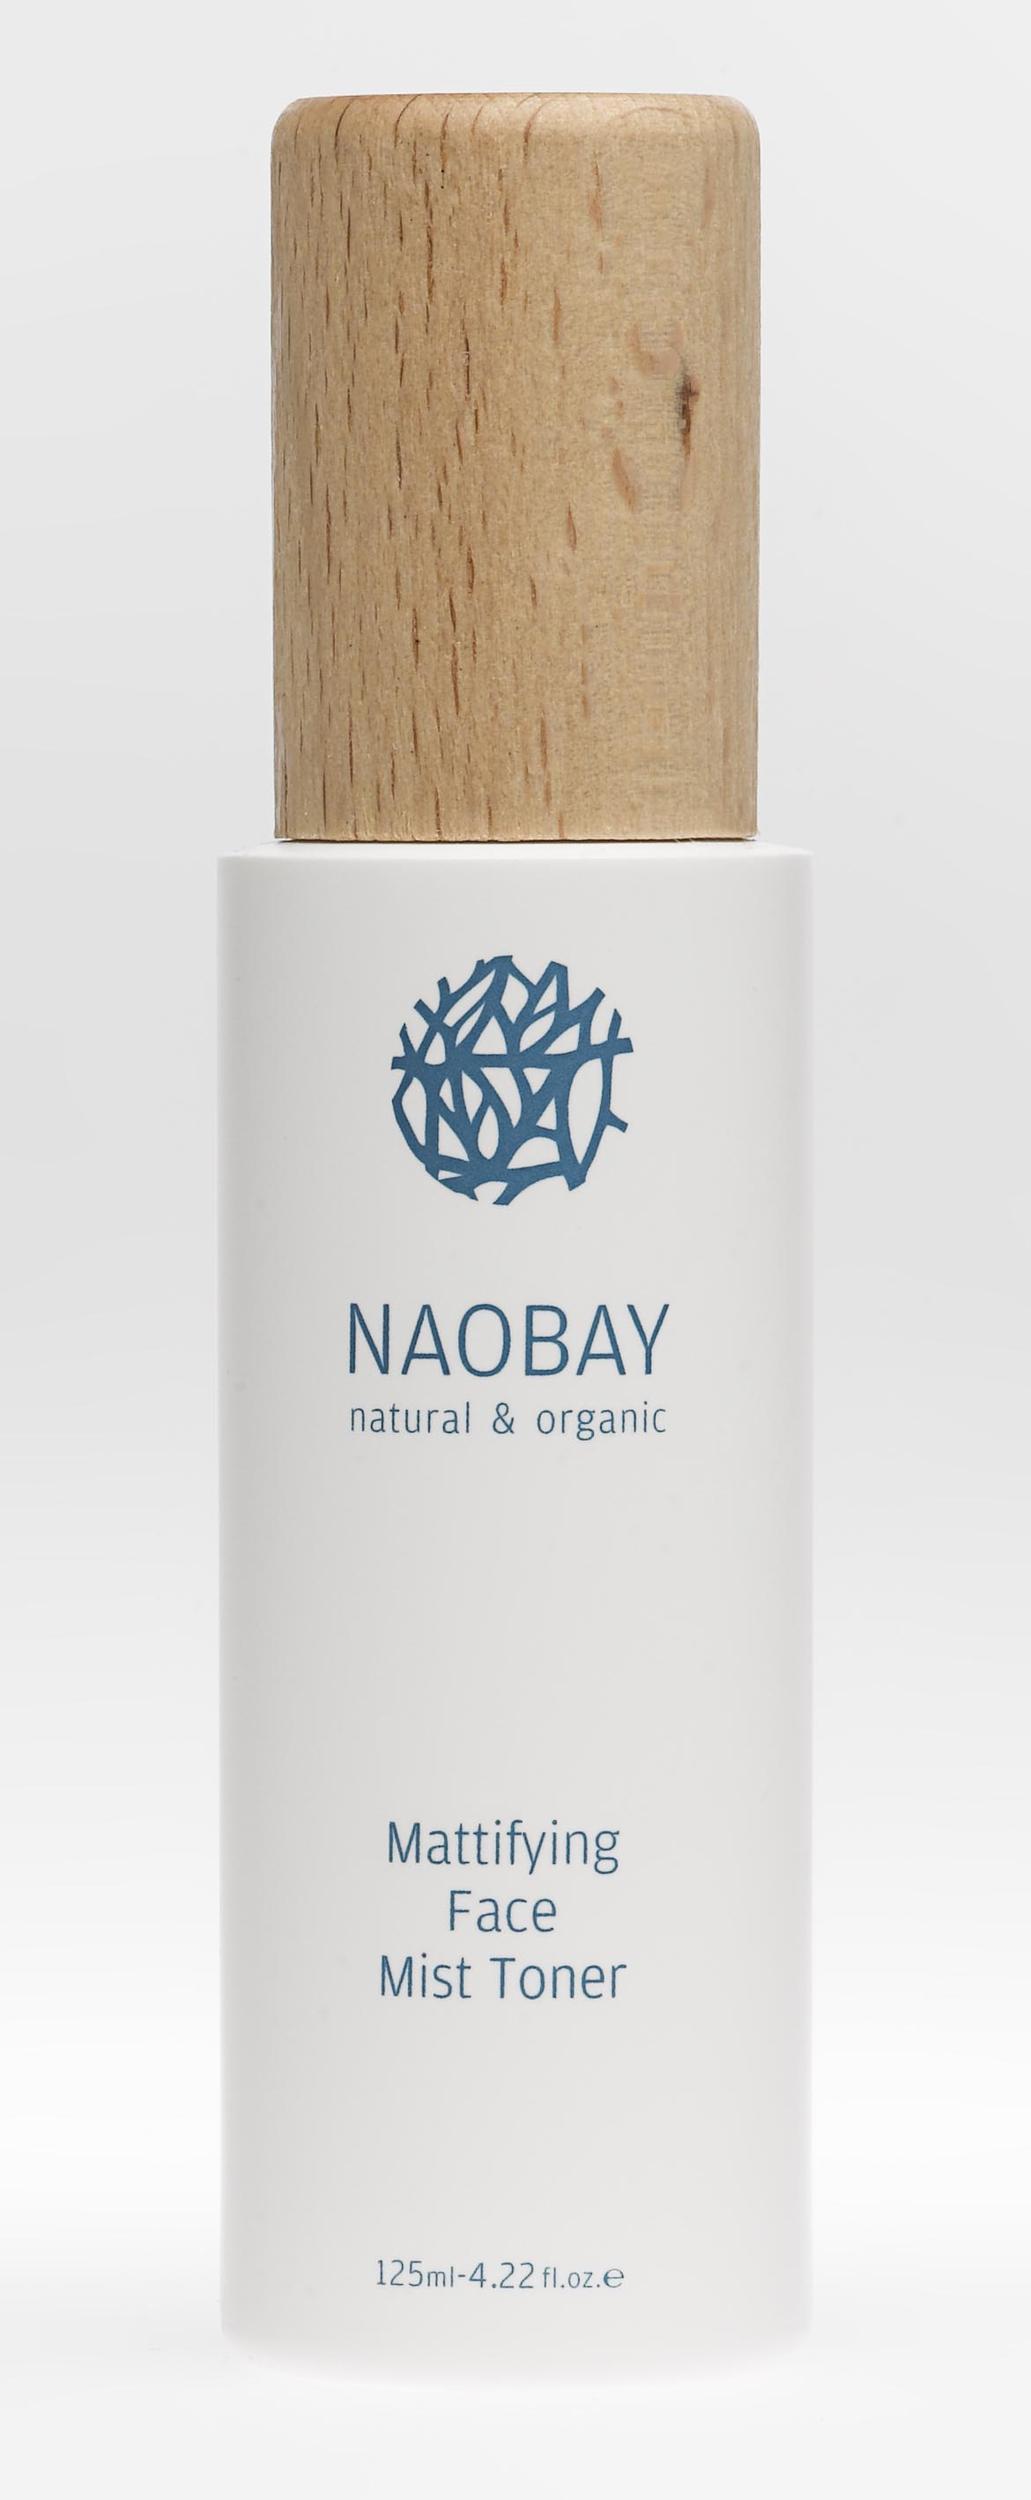 236 NAOBAY_MATTIFYING_FACE_MIST_TONER125ml